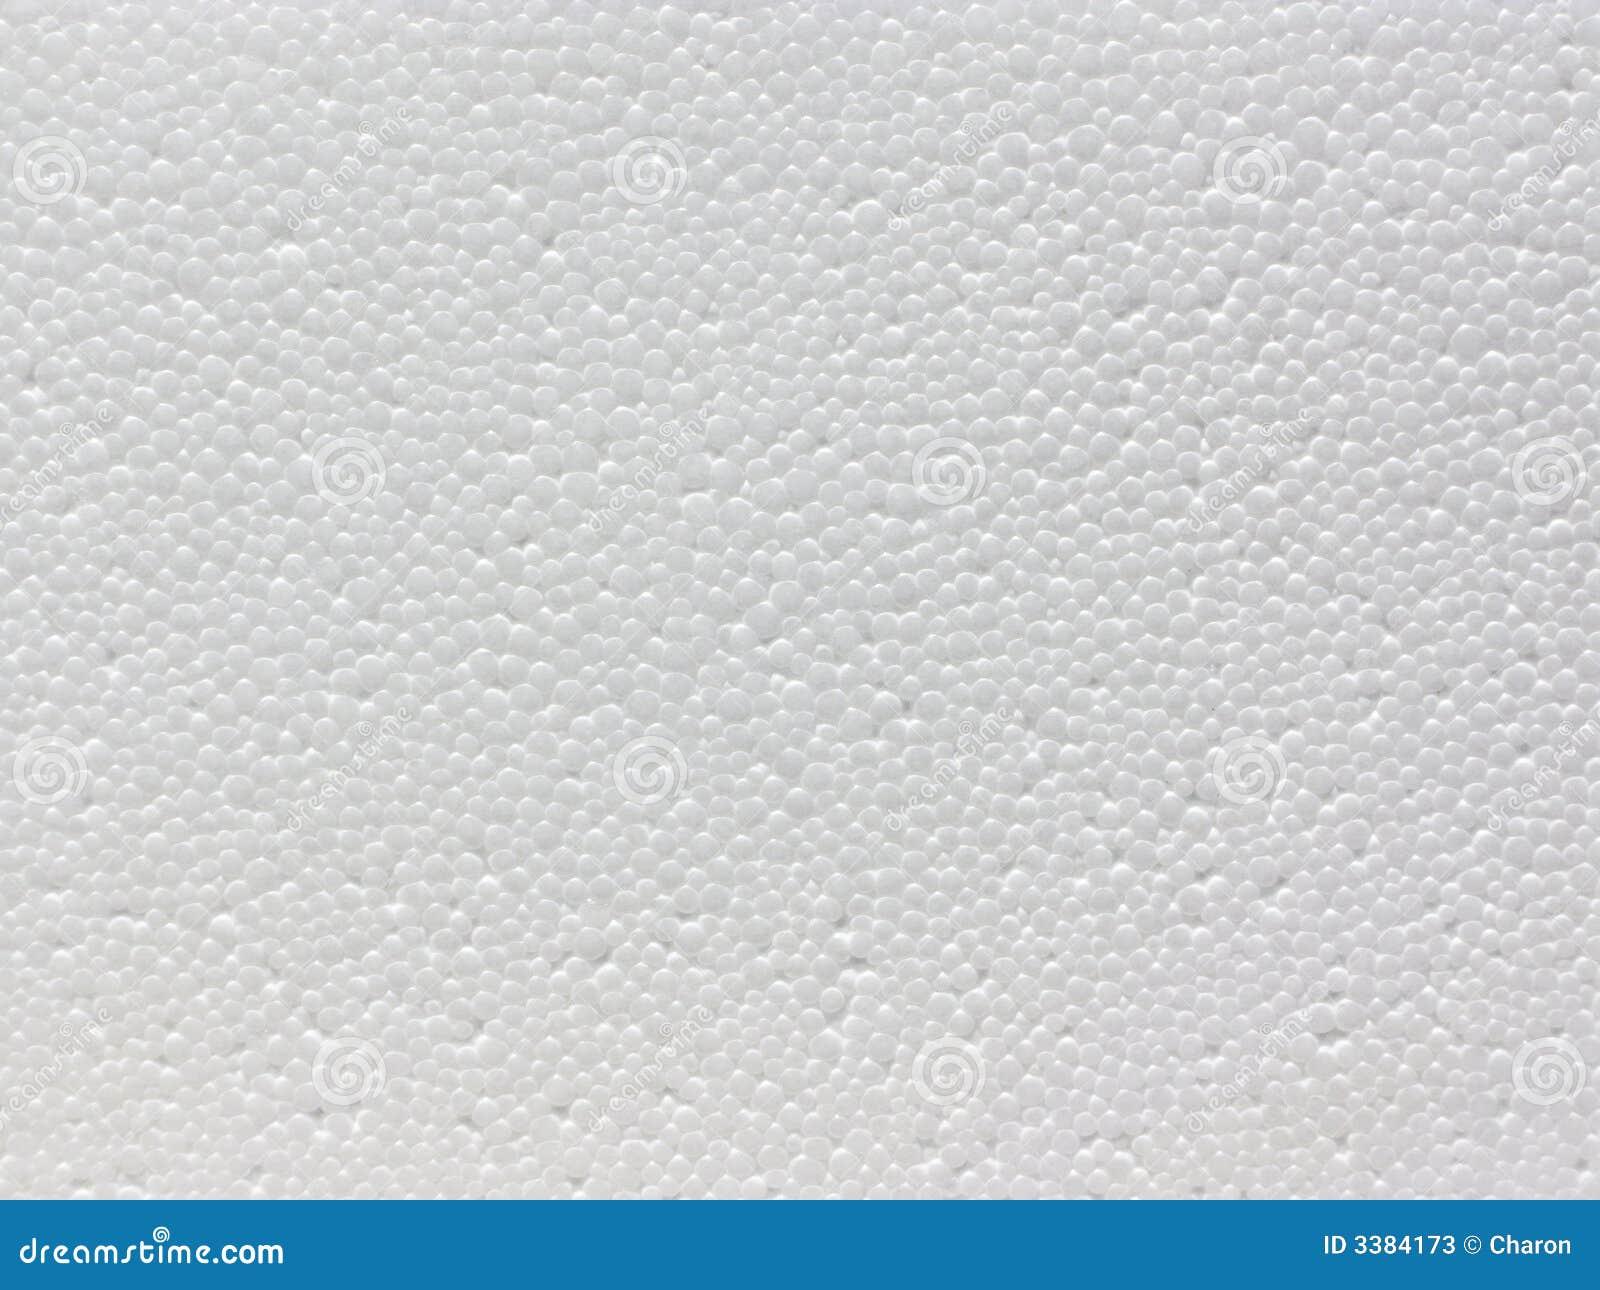 Polystyrene Foam Flat Surface Texture Stock Photos Image